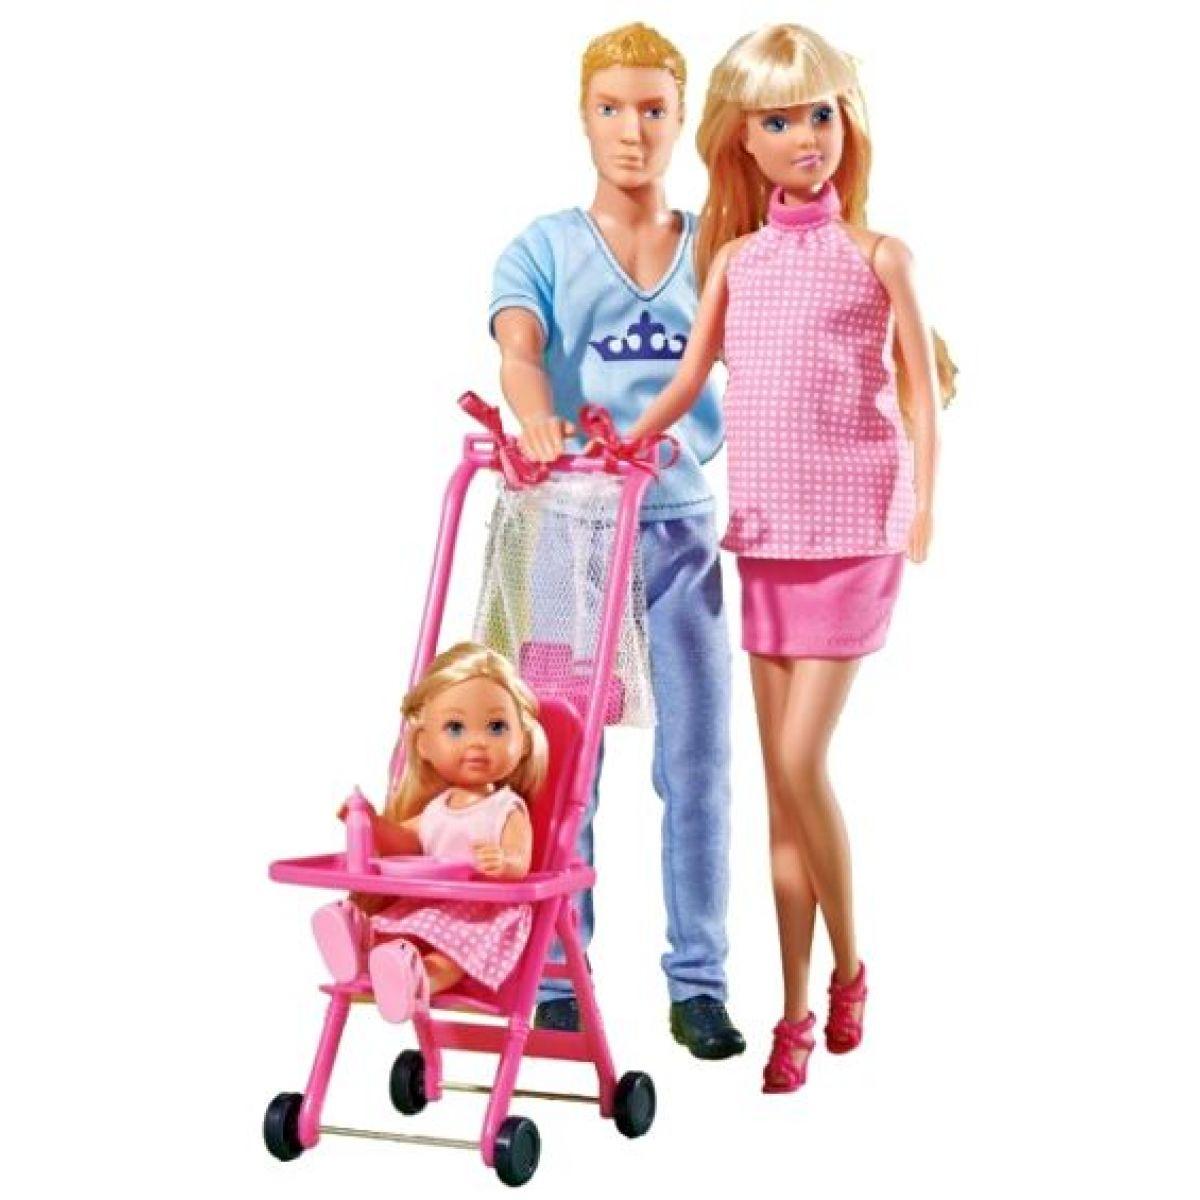 Panenka Steffi a šťastná rodina - Poškozený obal